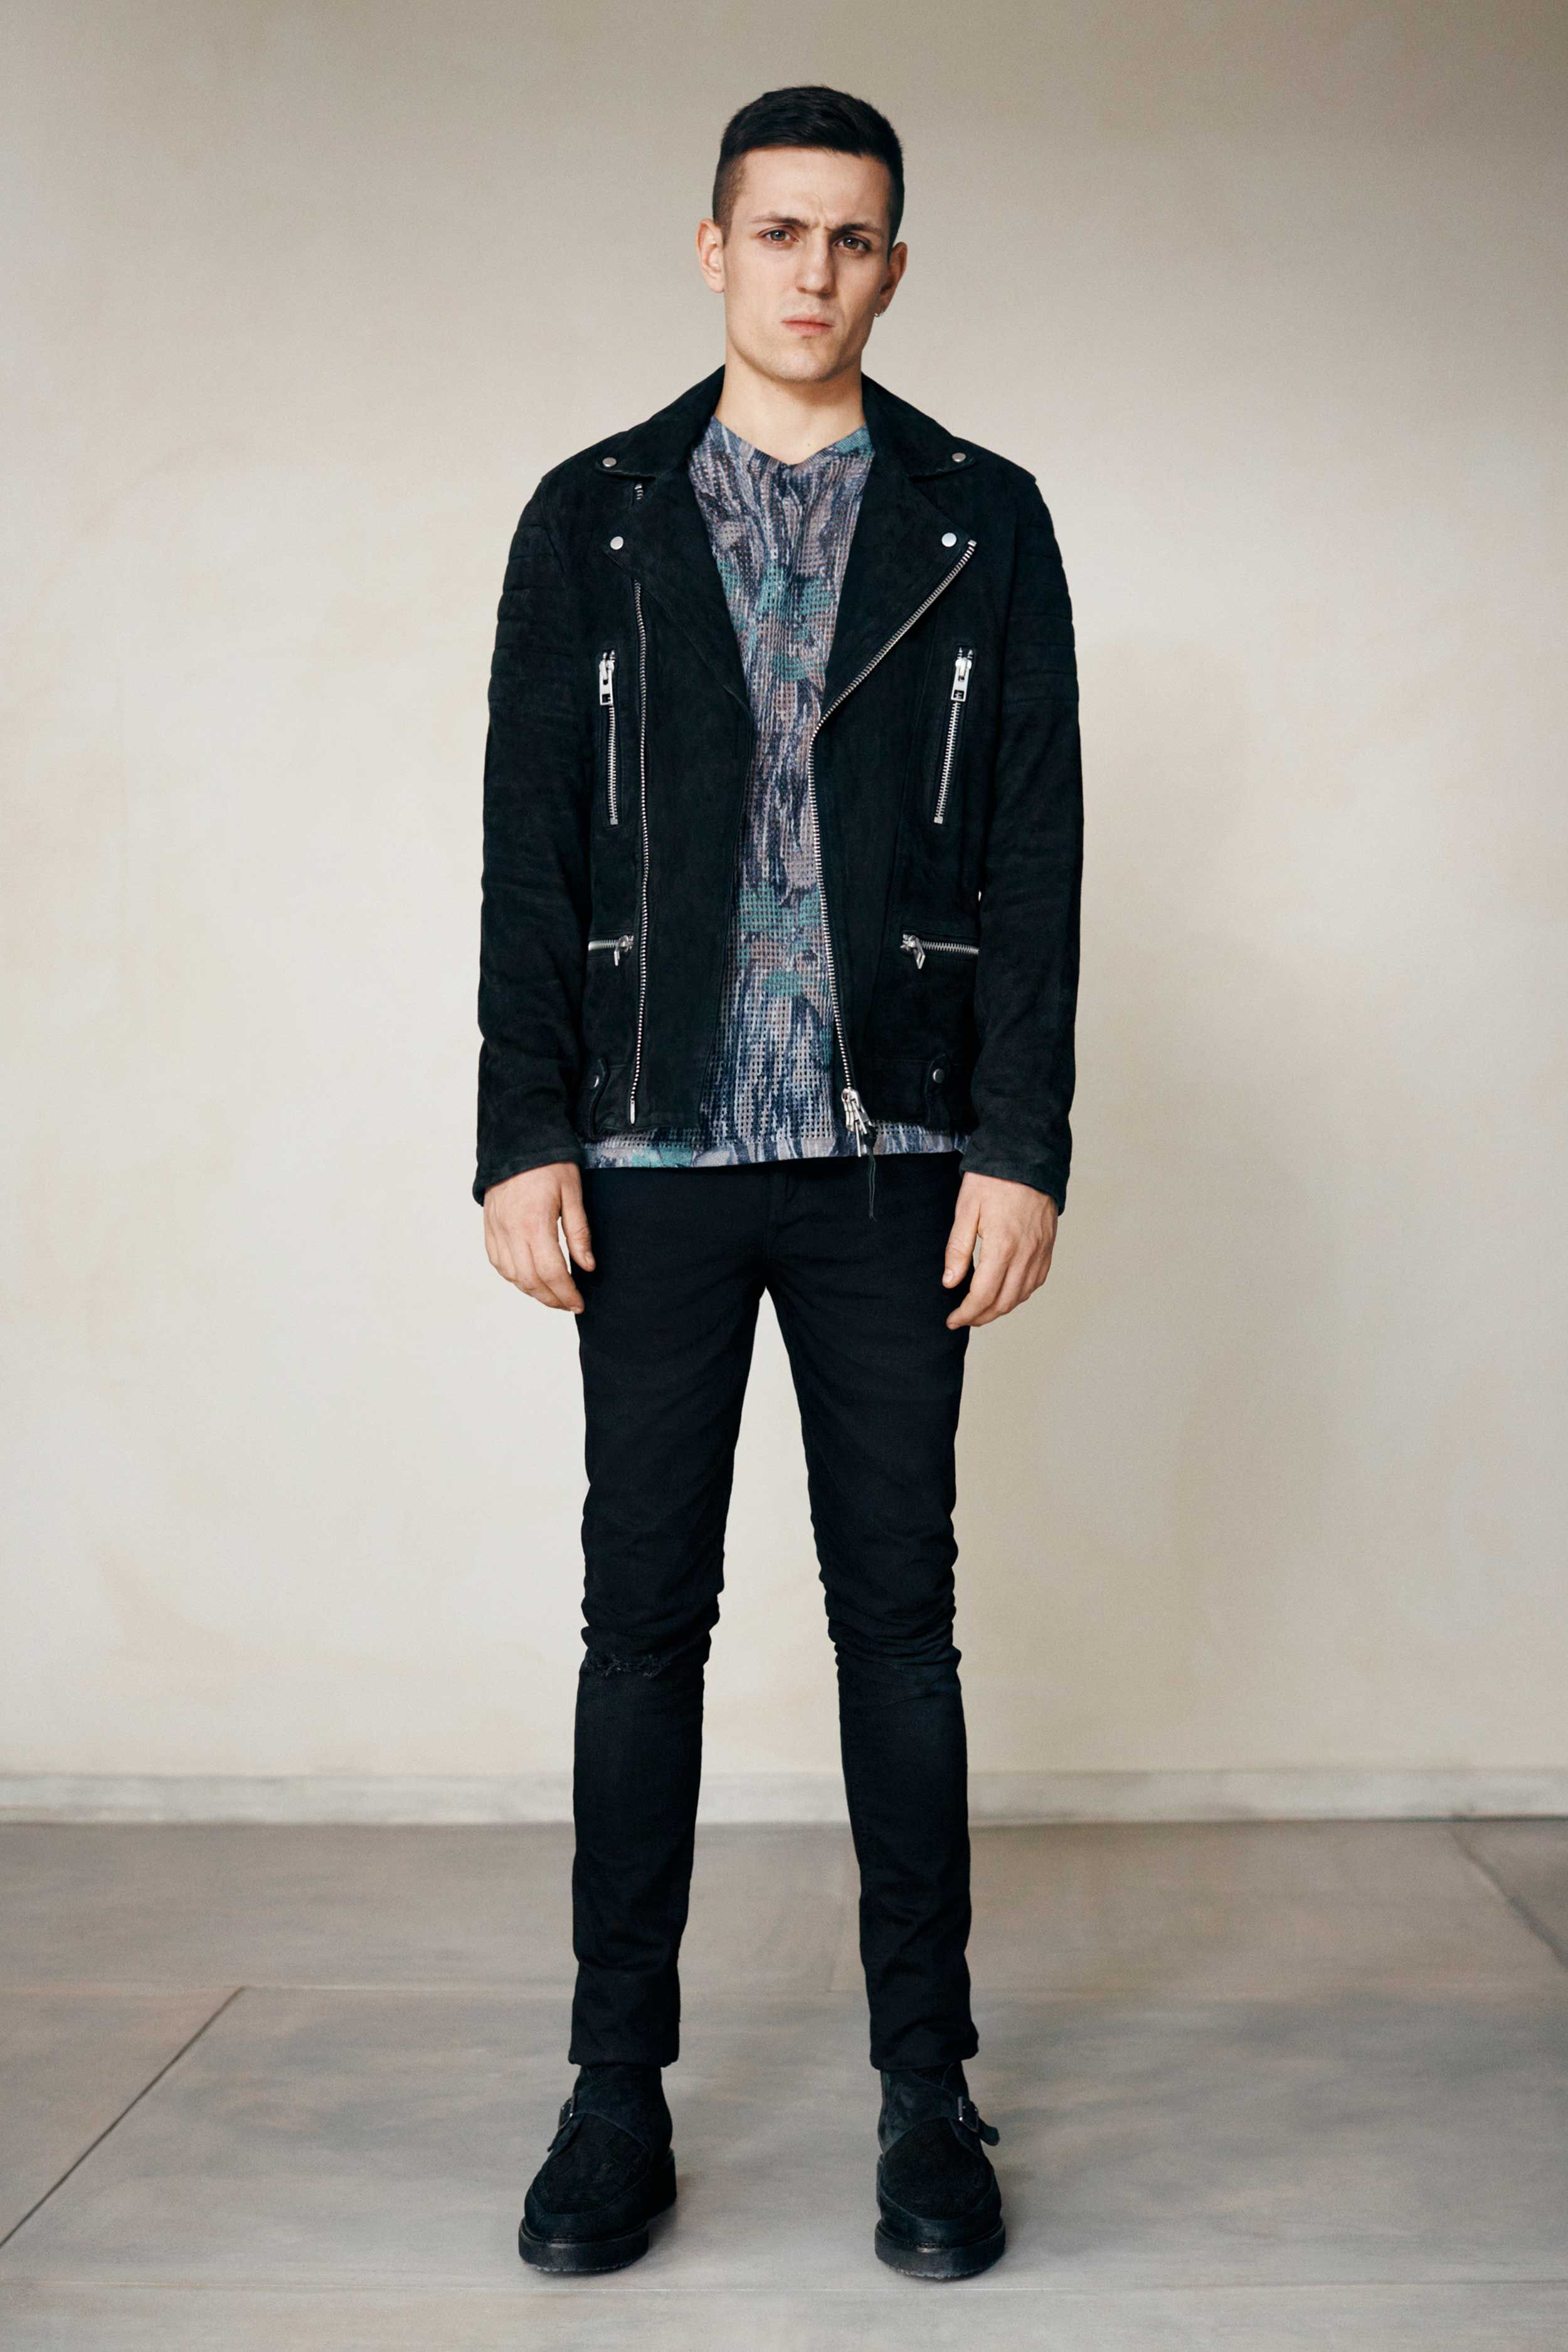 ALLSAINTS Men's lookbook 2015 April. LOOK 6. Streetwear